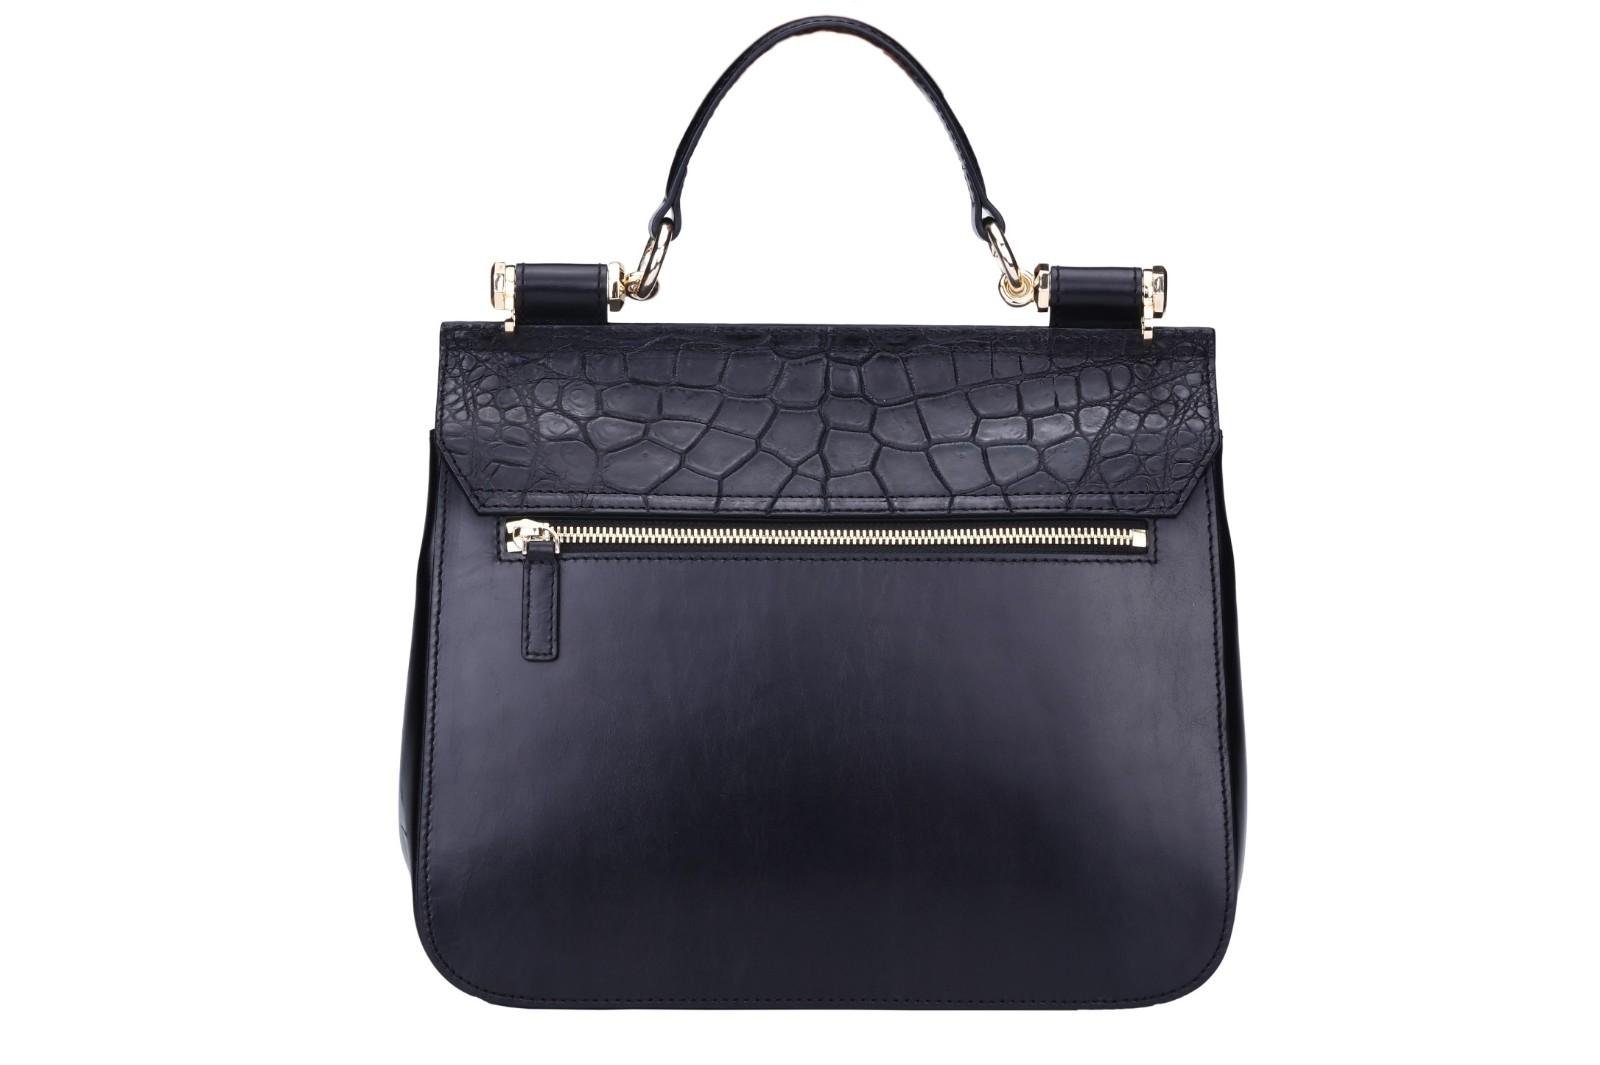 GF bags-Professional Ladies Bag Affordable Handbags From Gaofeng Bags-5